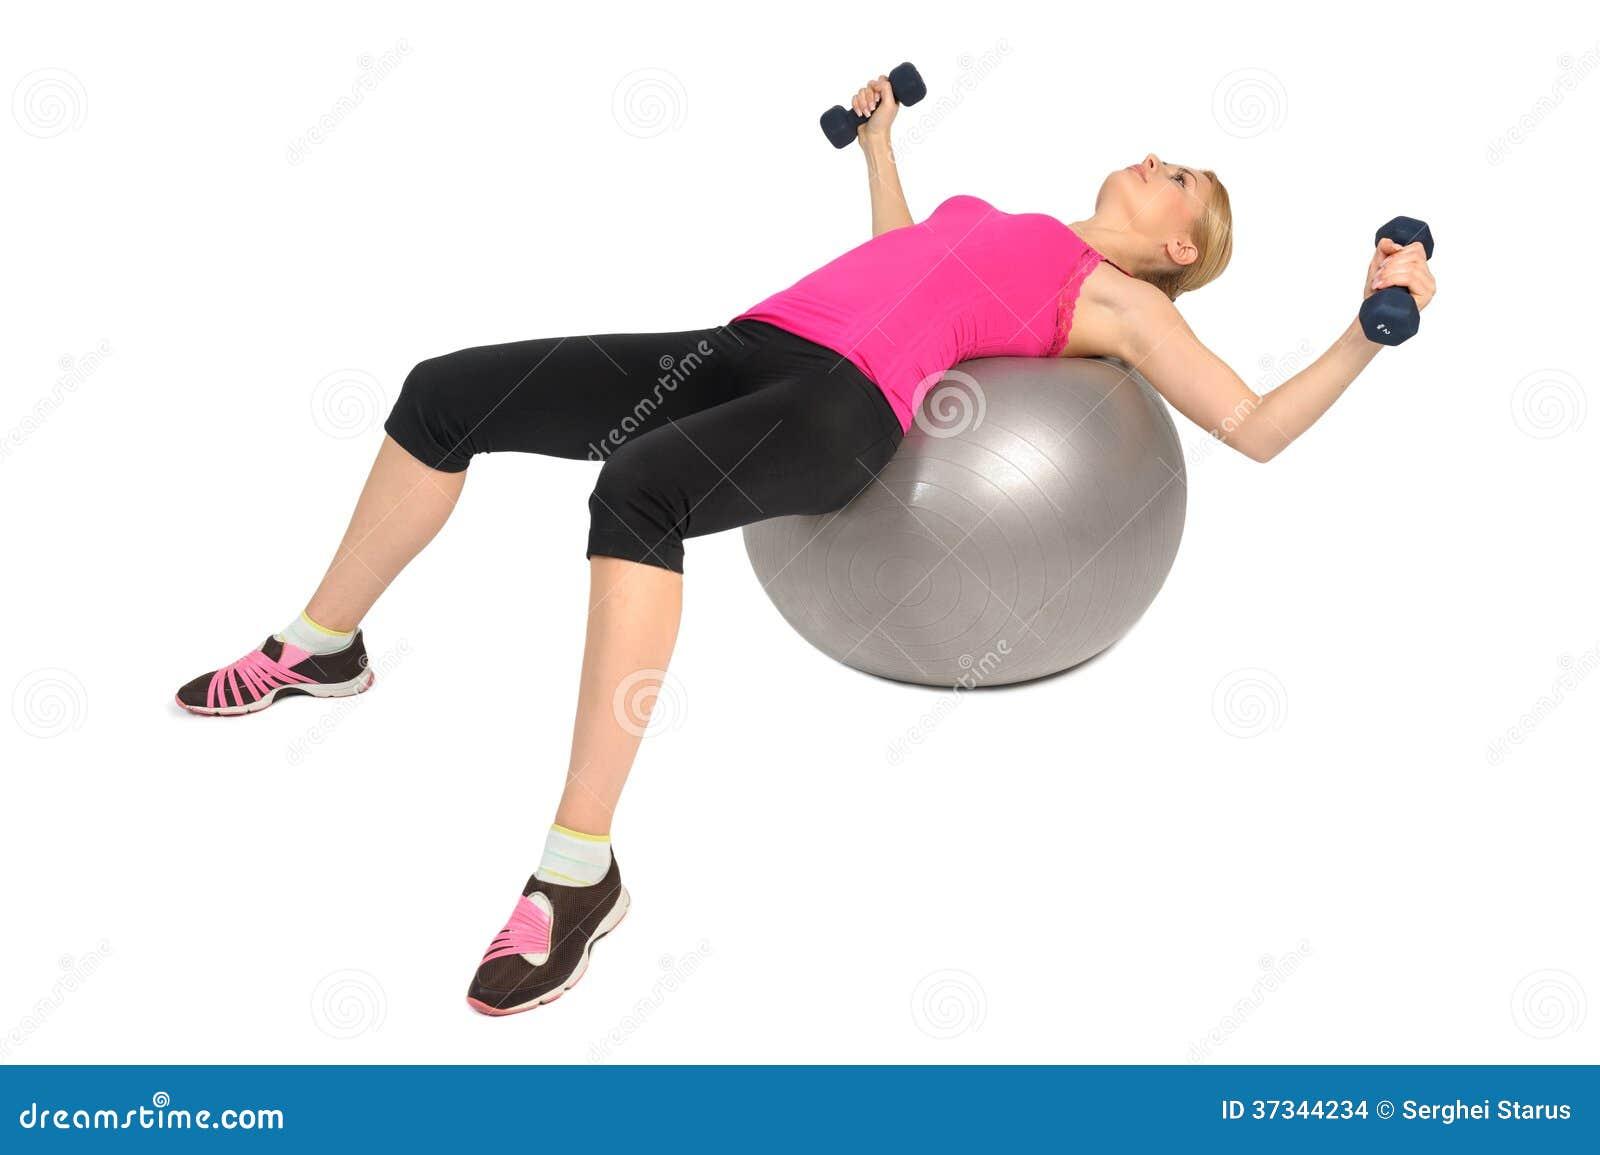 Dumbbell Chest Fly On Stability Ball | www.imgkid.com ...